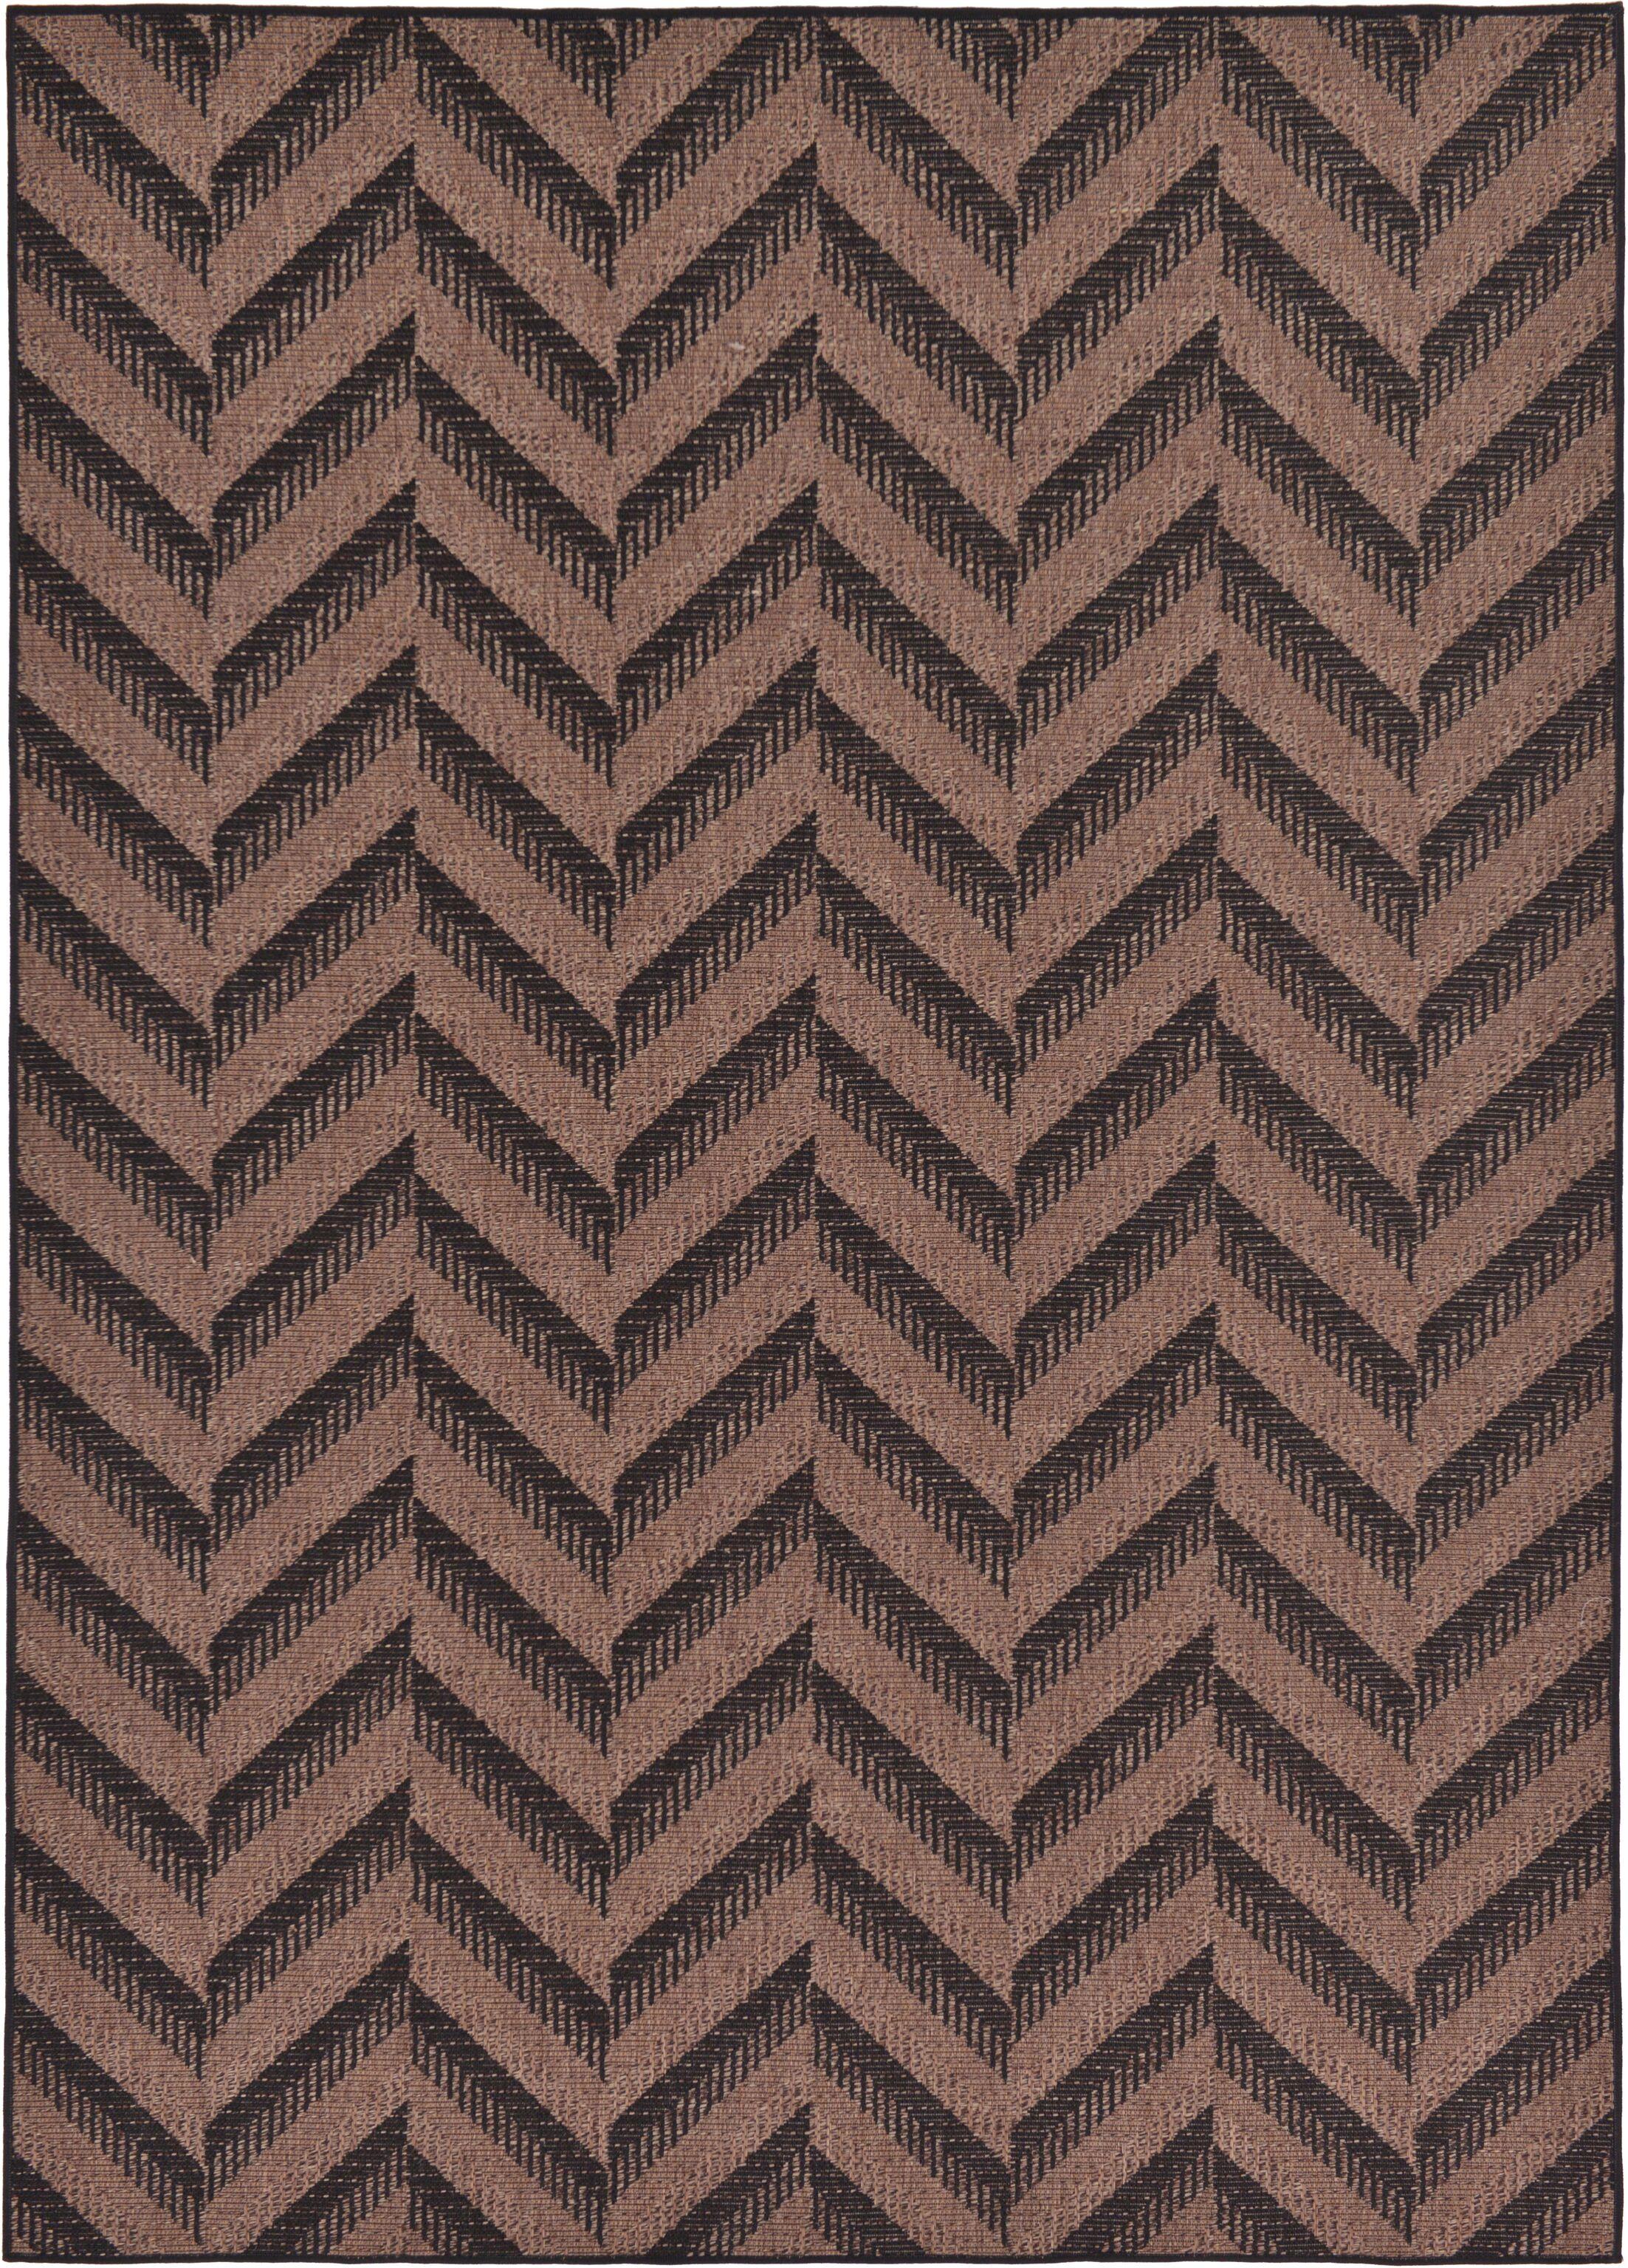 Jordan Brown Outdoor Area Rug Rug Size: Rectangle 7' x 10'